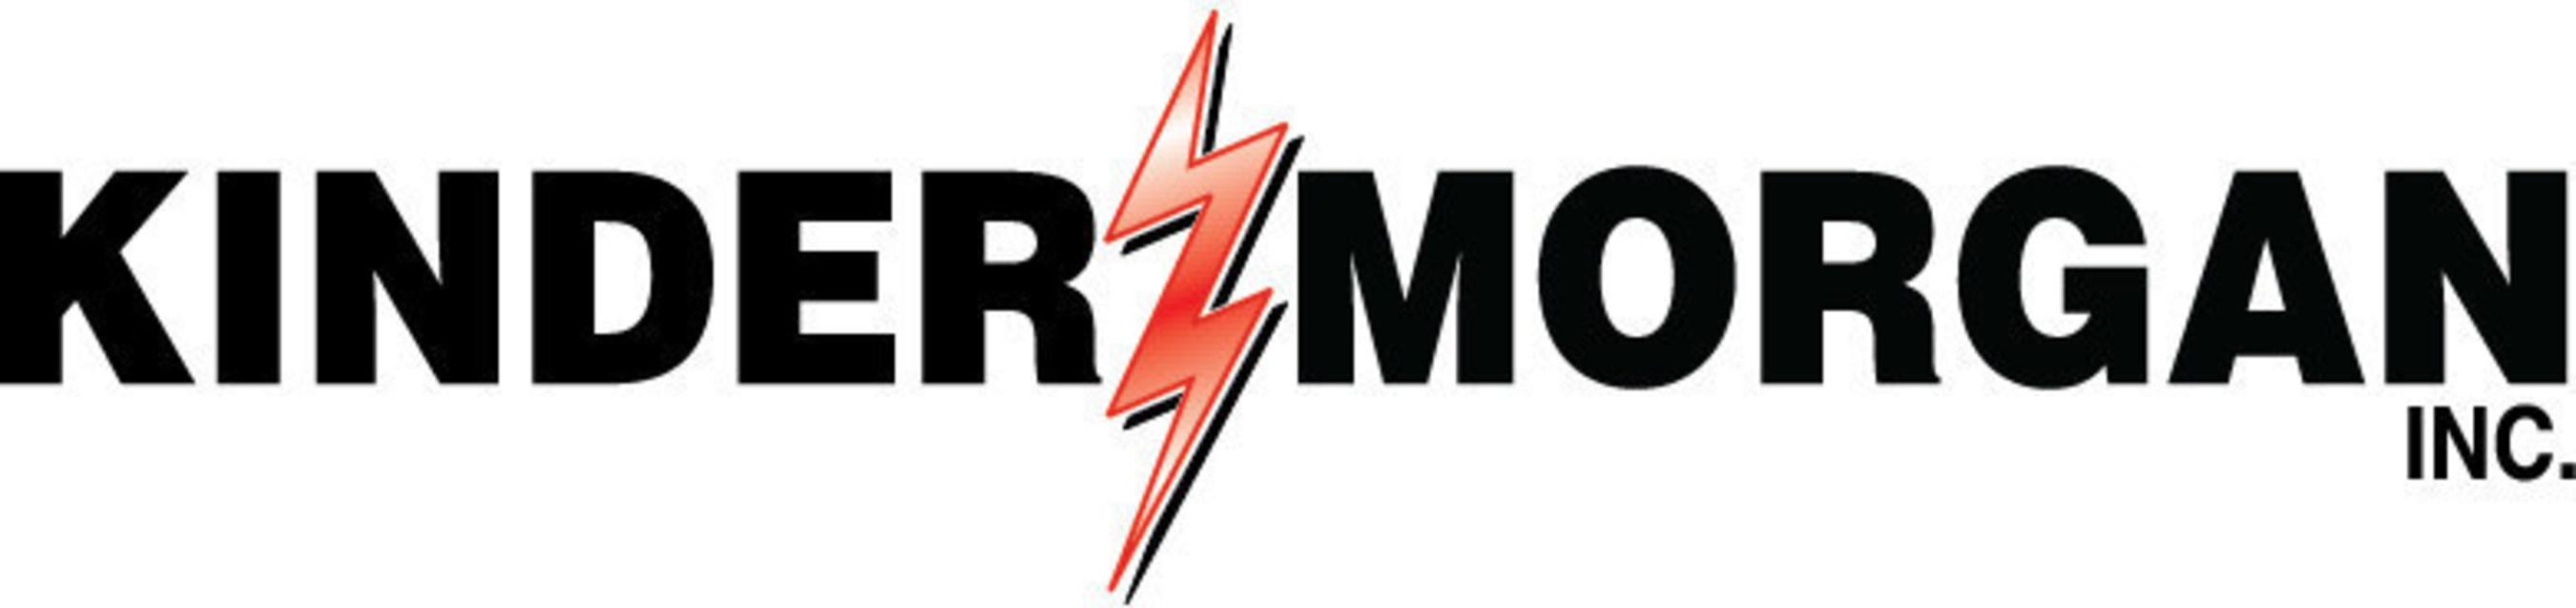 Customer Logo #3 of SETLD